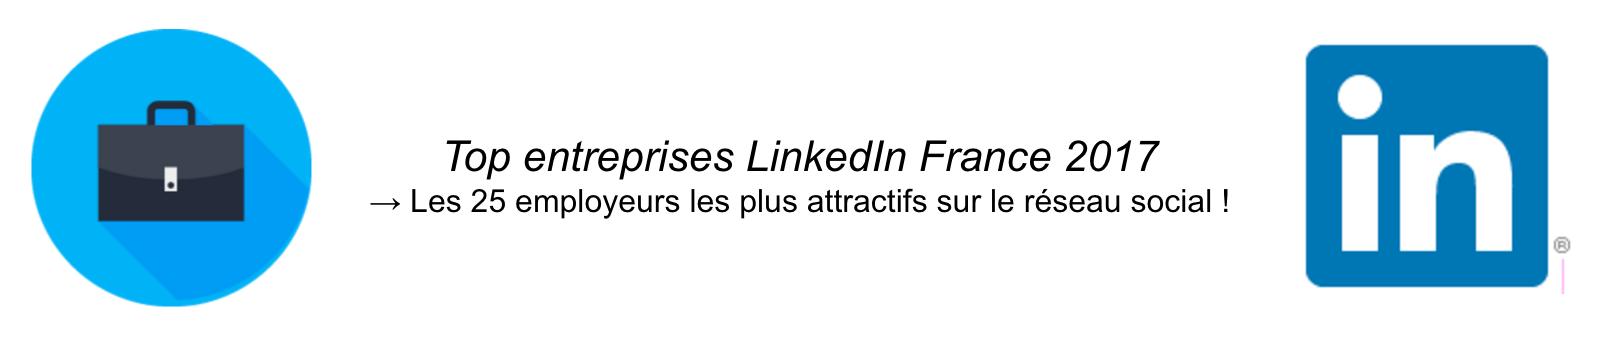 classement-top-entreprises-linkedin-france-2017